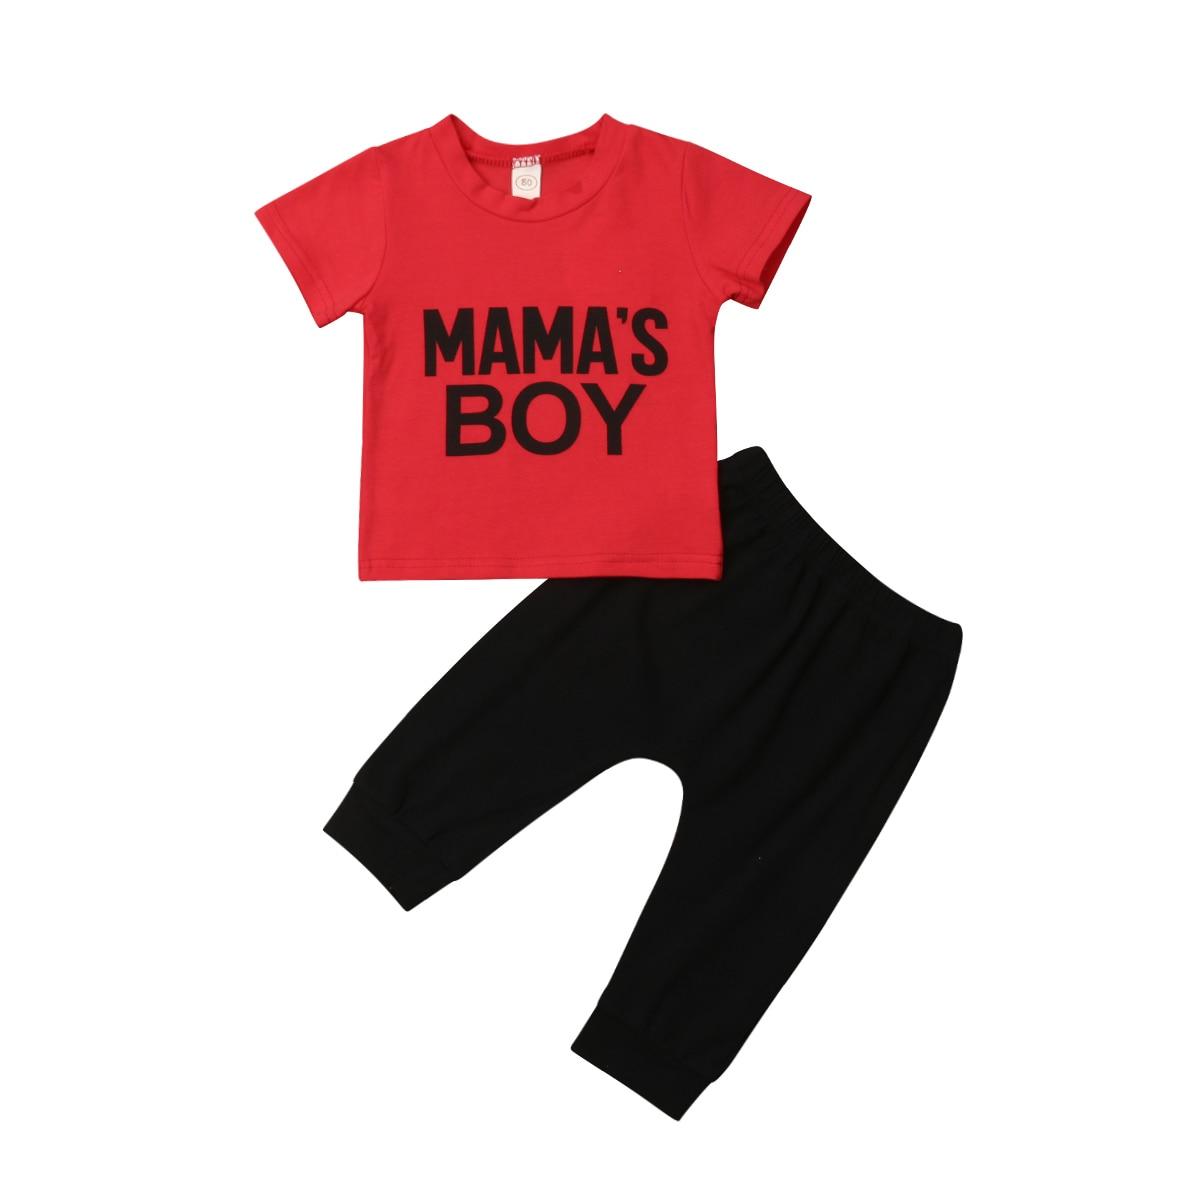 0-4y Kleinkind Kinder Baby Jungen Sommer Kleidung Kurzarm Baumwolle T-shirt Tops Harem Hose 2 Pcs Outfits Jungen Kleidung Set